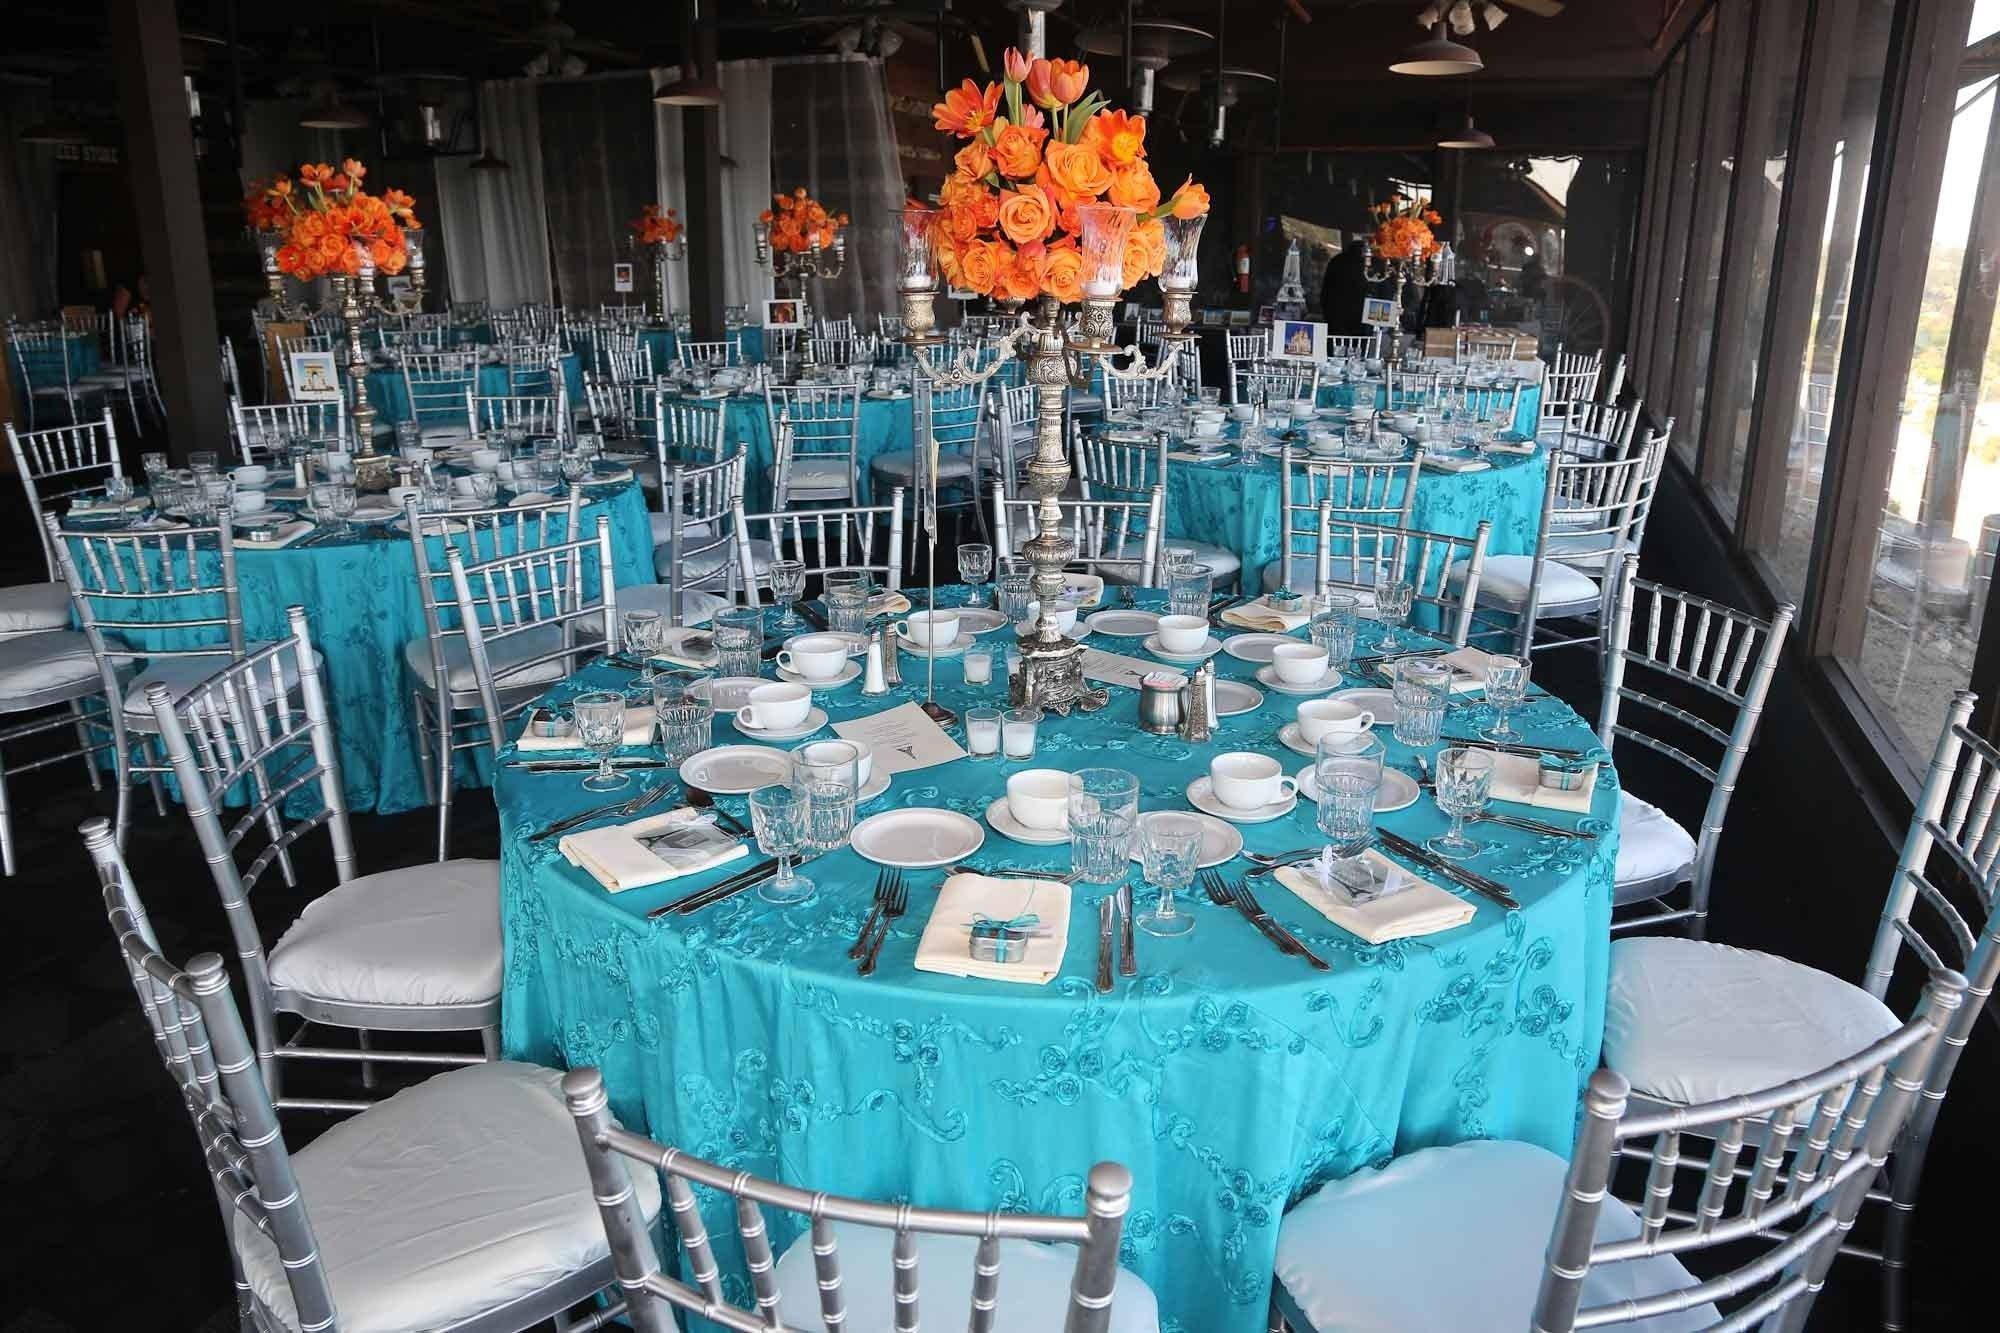 10 Fabulous Graduation Party Ideas Martha Stewart decorating dining tables graduation party ideas martha stewart 2020